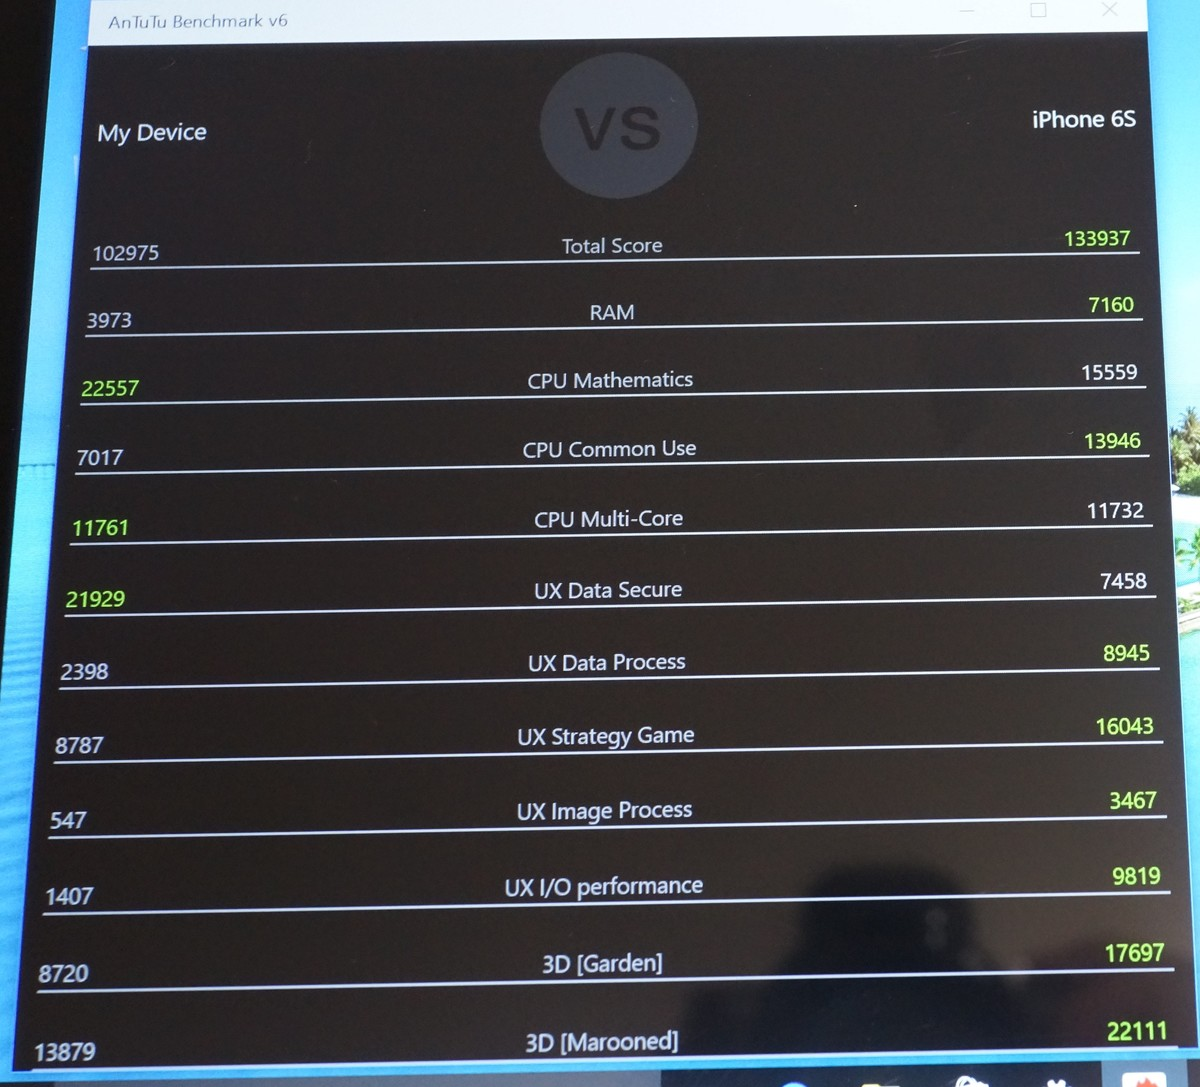 Teclast Tbook 16 Power windows側のベンチマークテスト結果参考画像